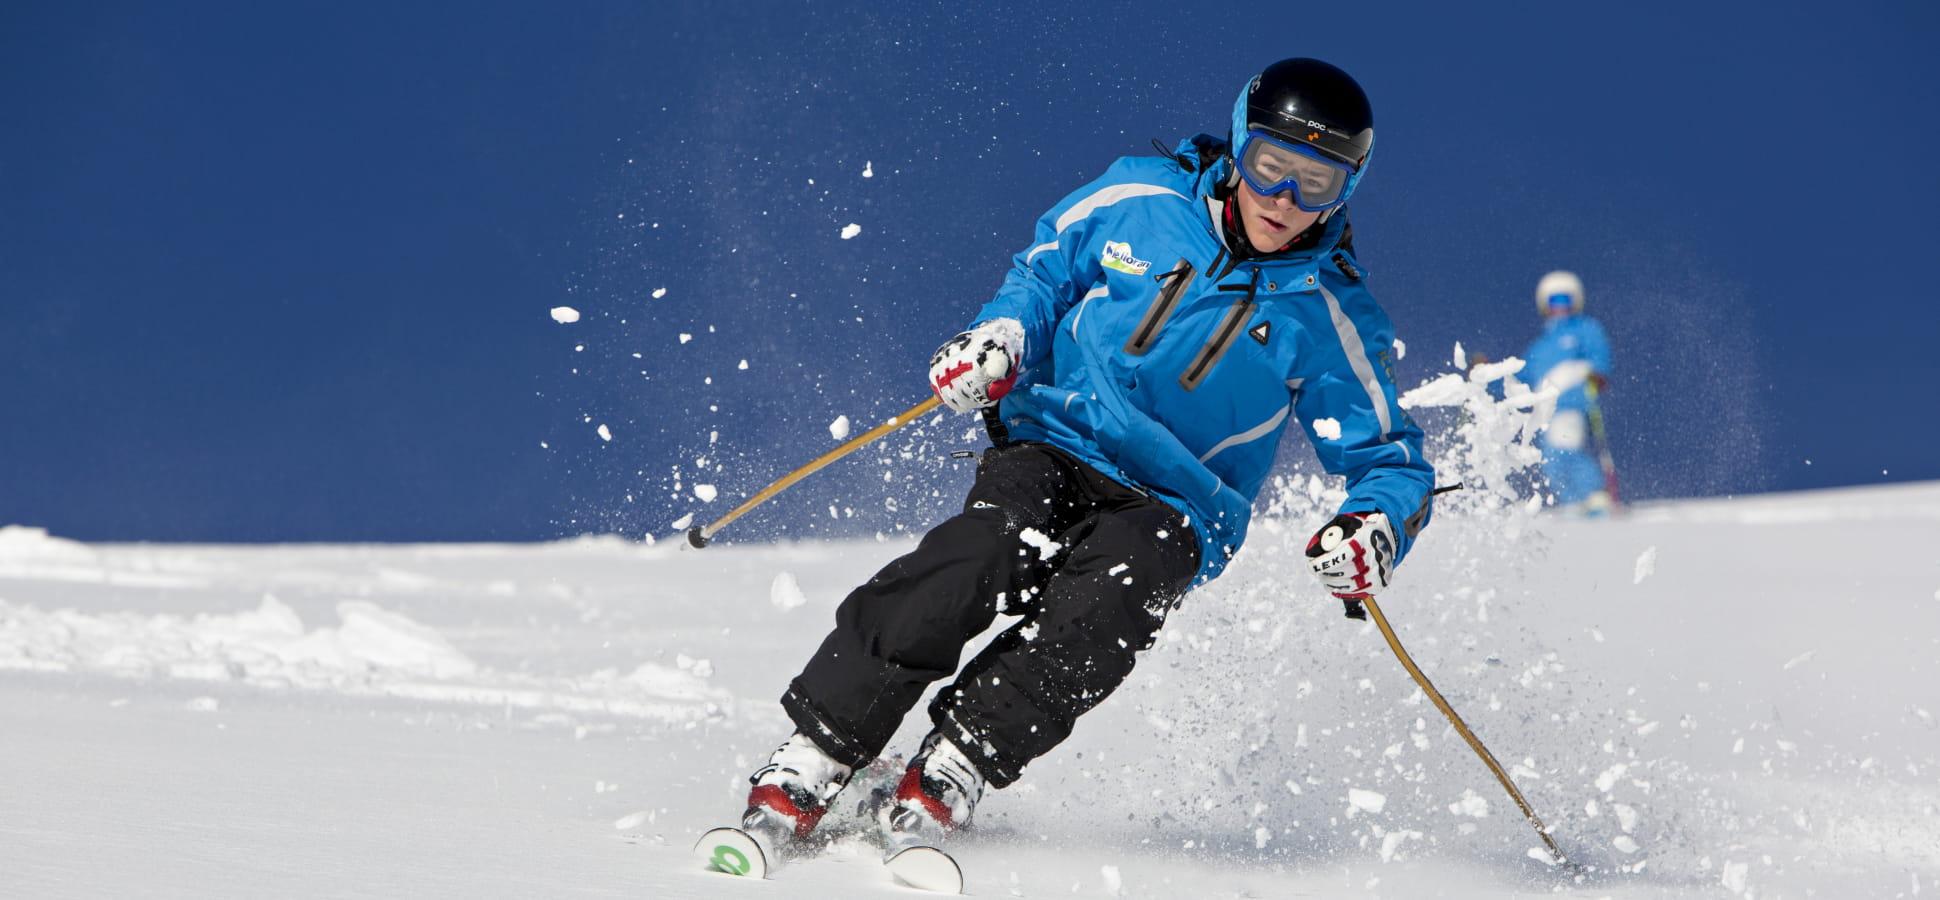 Lioran-ski alpin